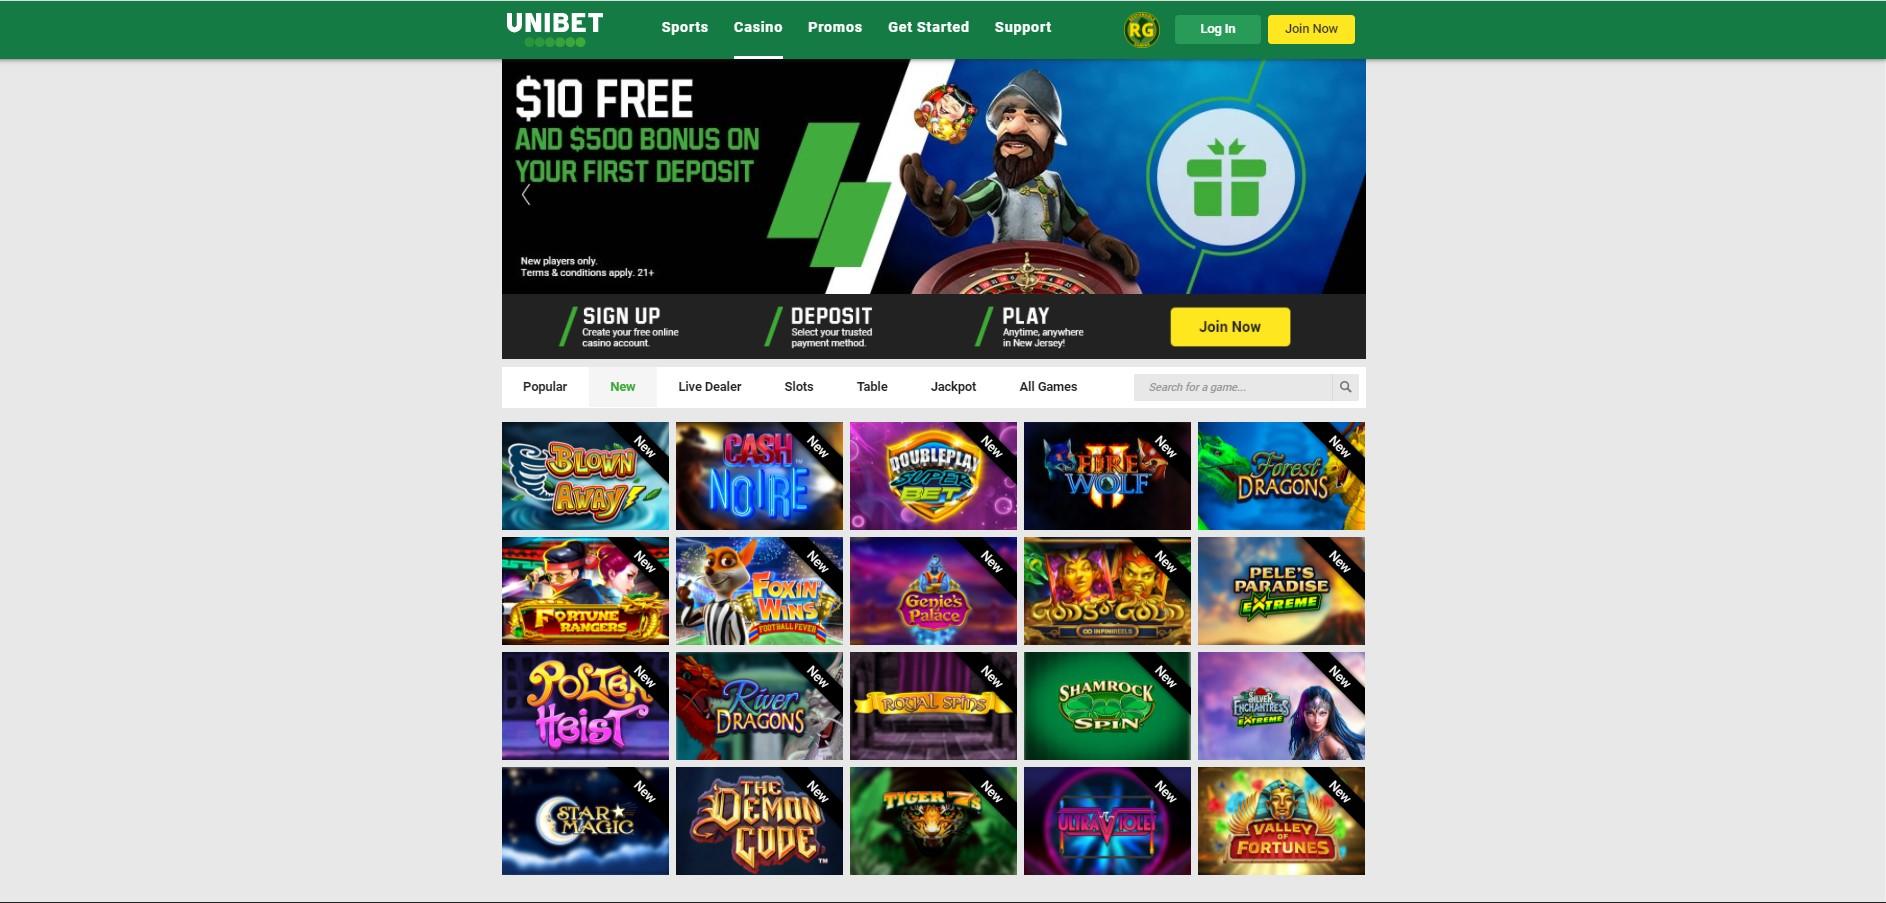 Contact unibet casino bonus code get $10 free with ubcasino10 sports gambling laws